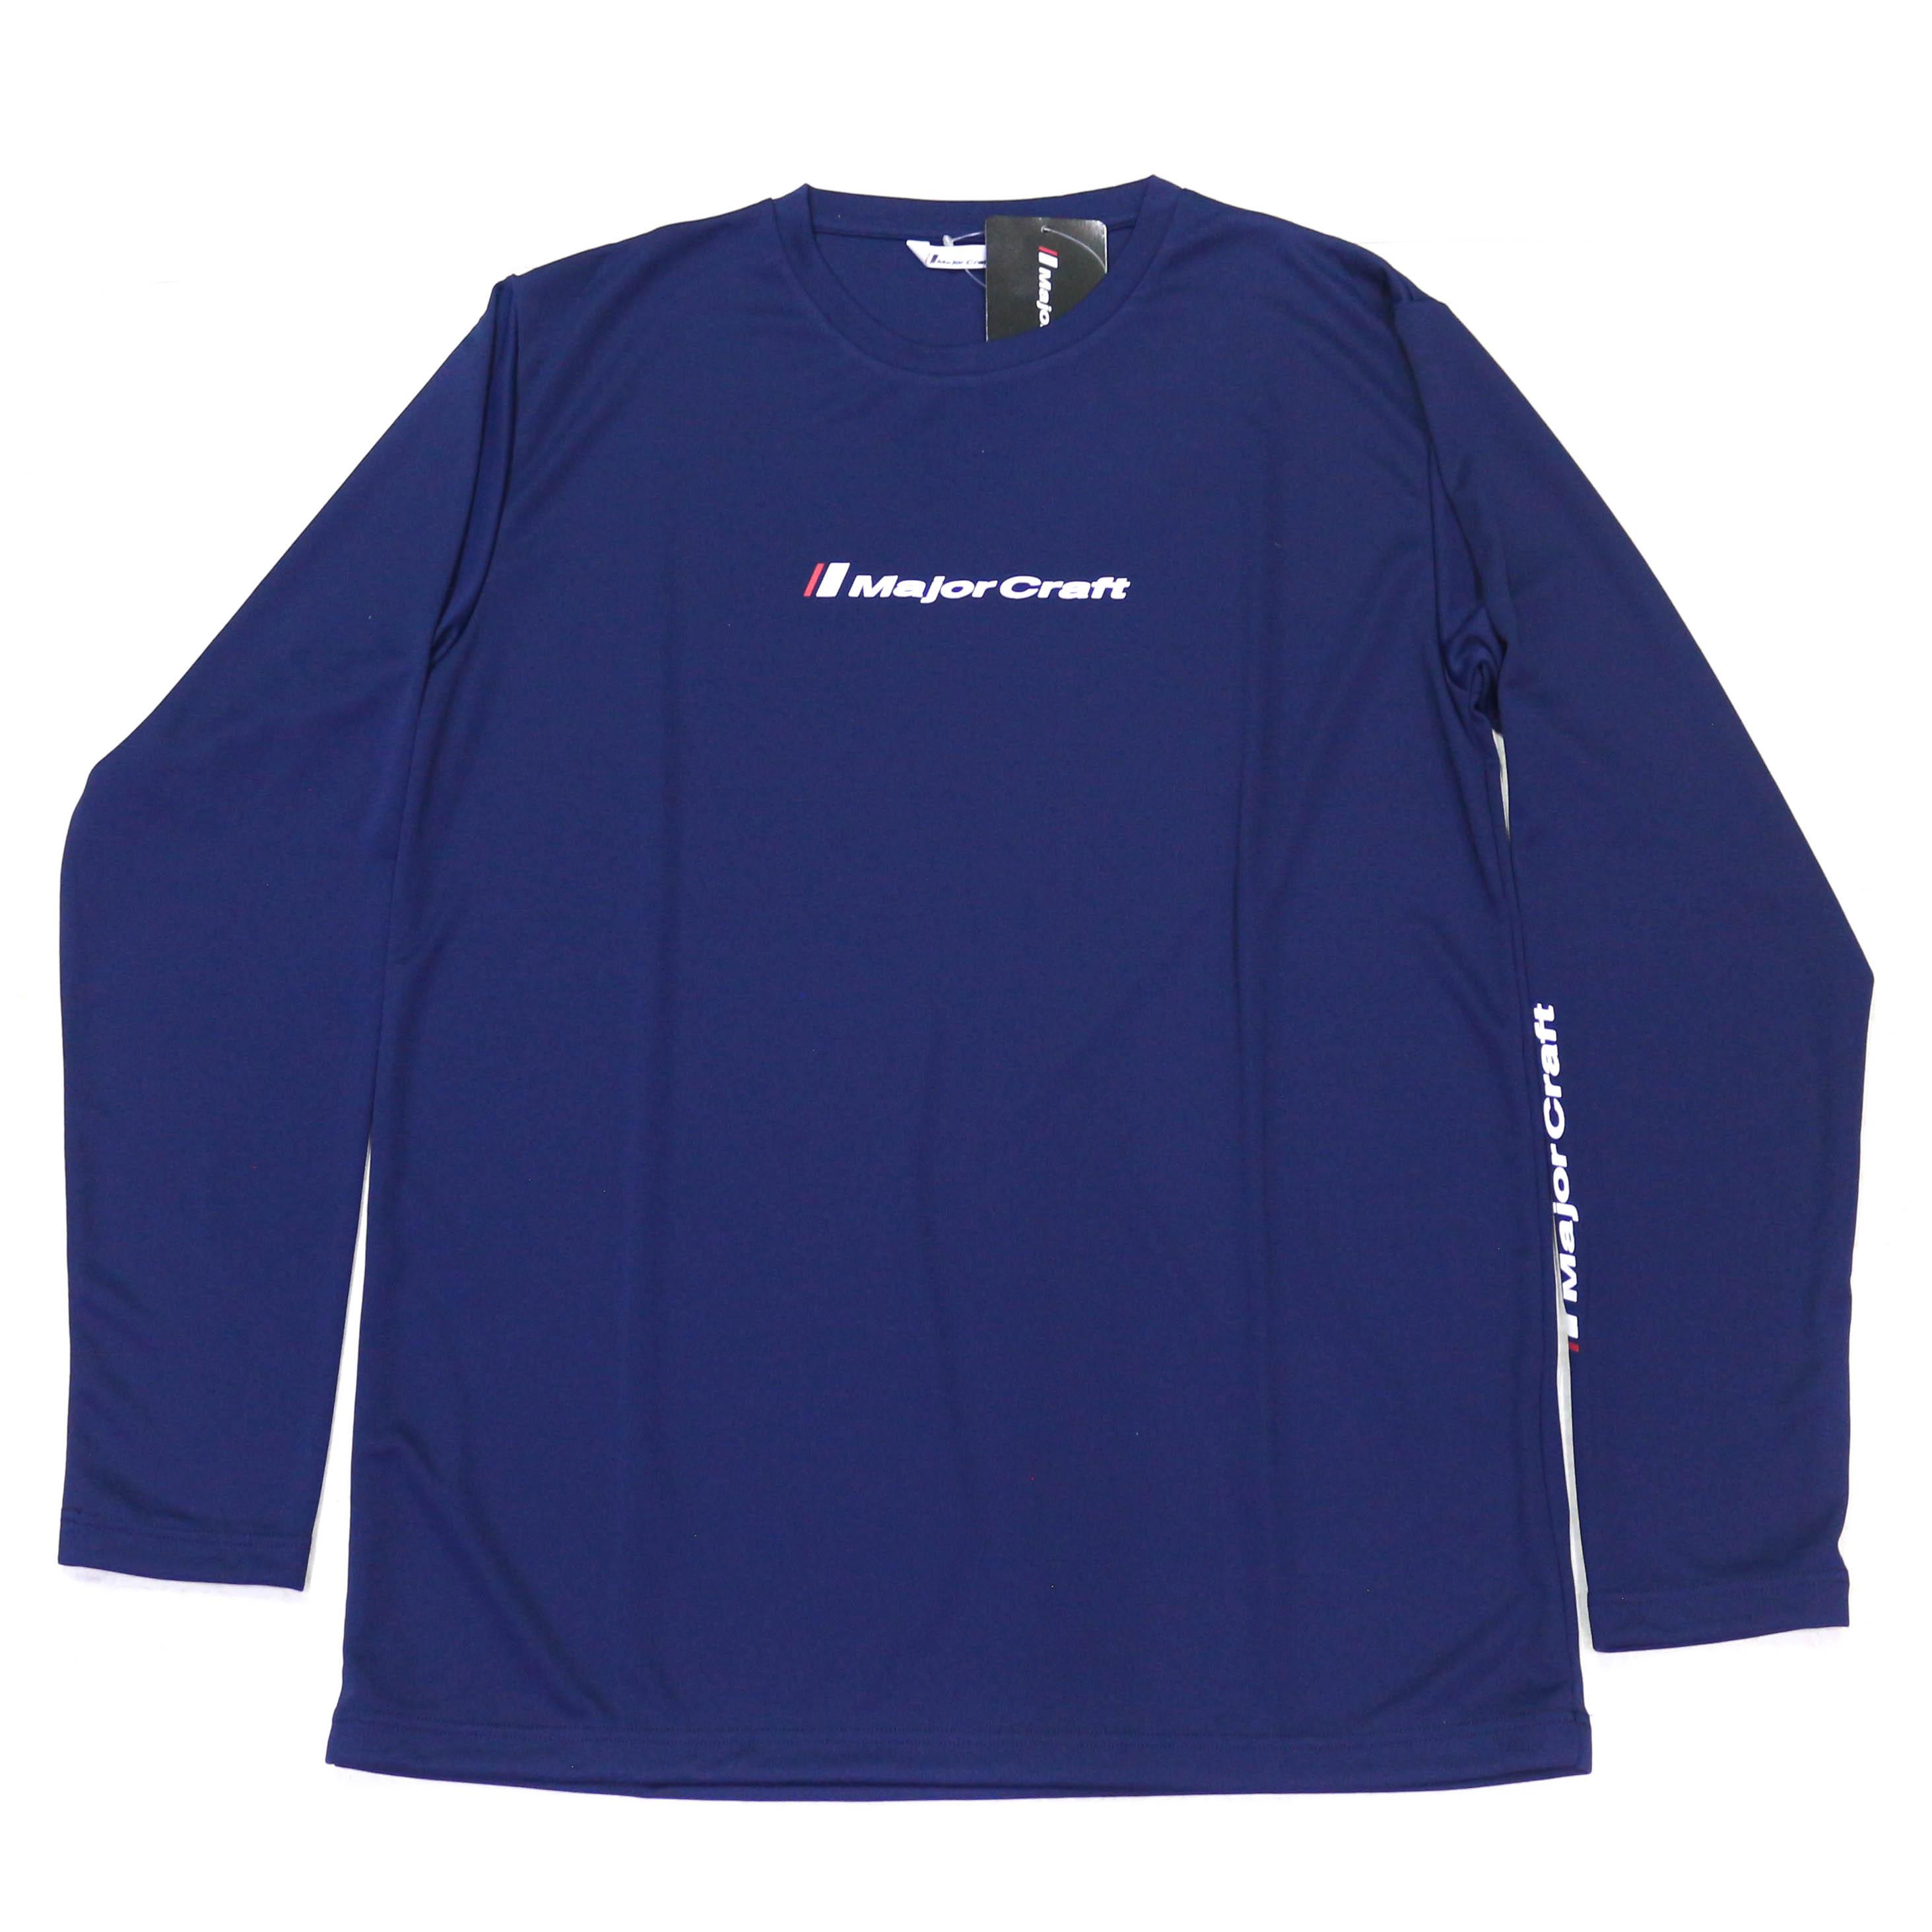 Major Craft T-Shirt Long Sleeve MCW-DLT-LL/NV (3147)